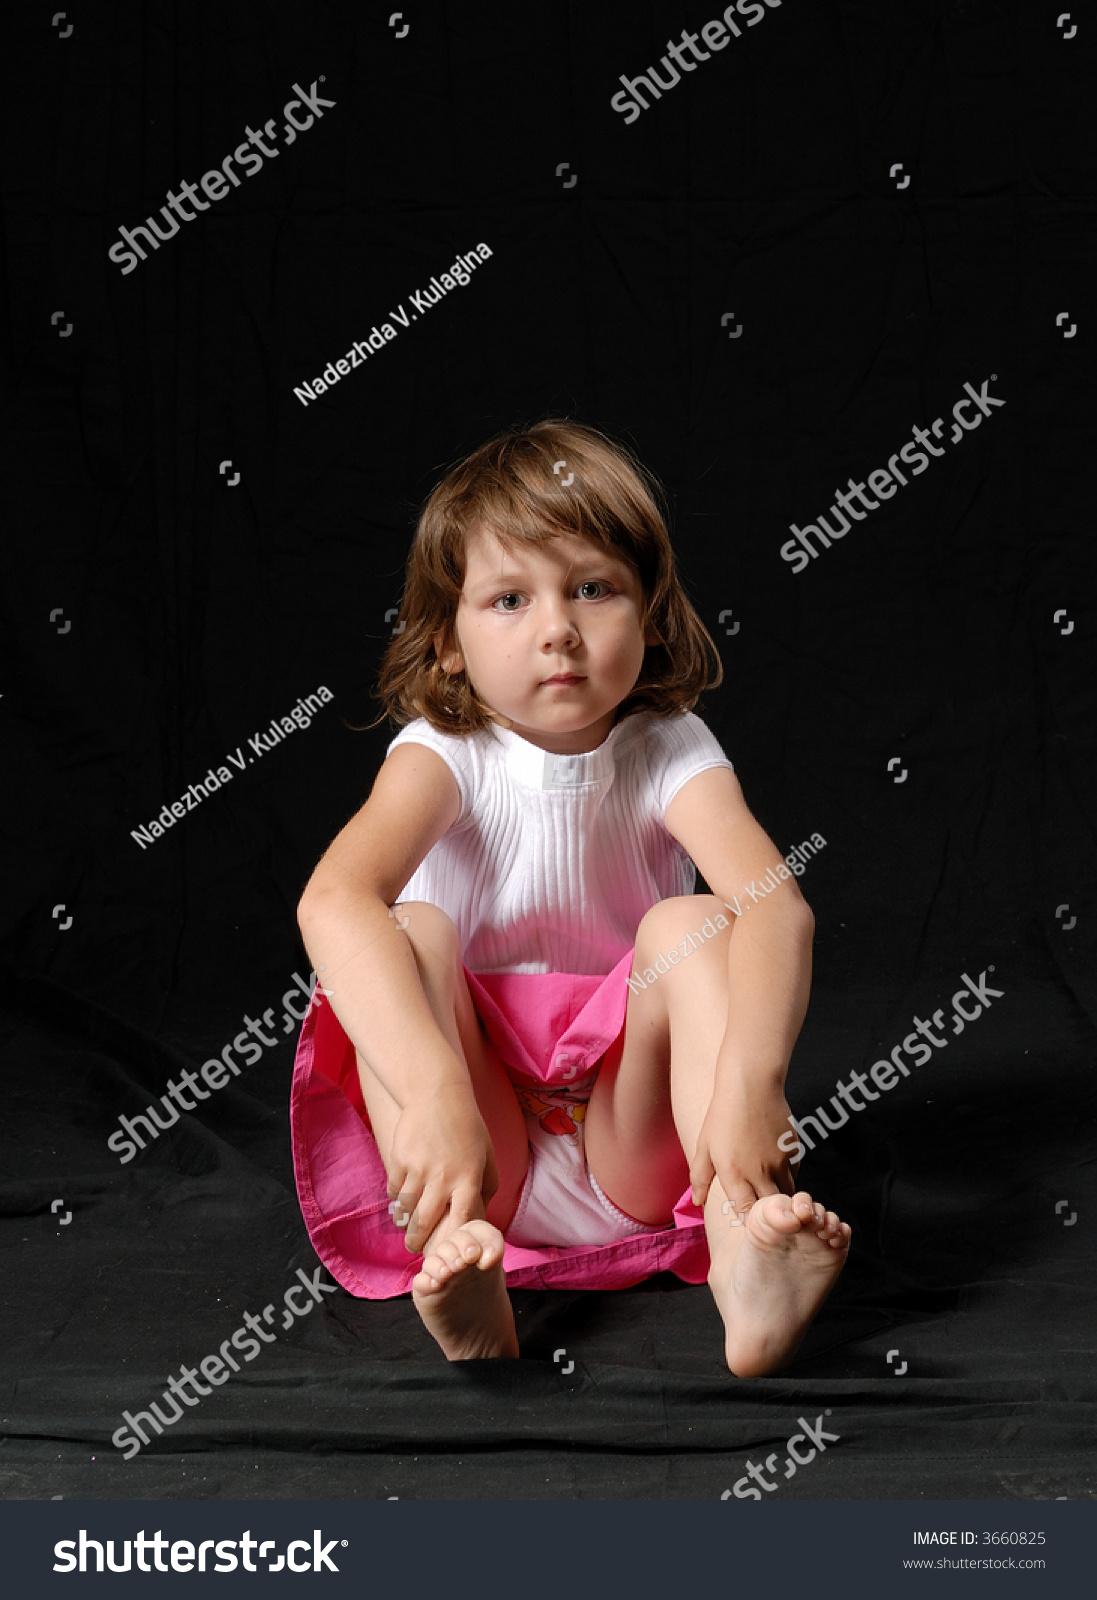 spread legs Young girl upskirt